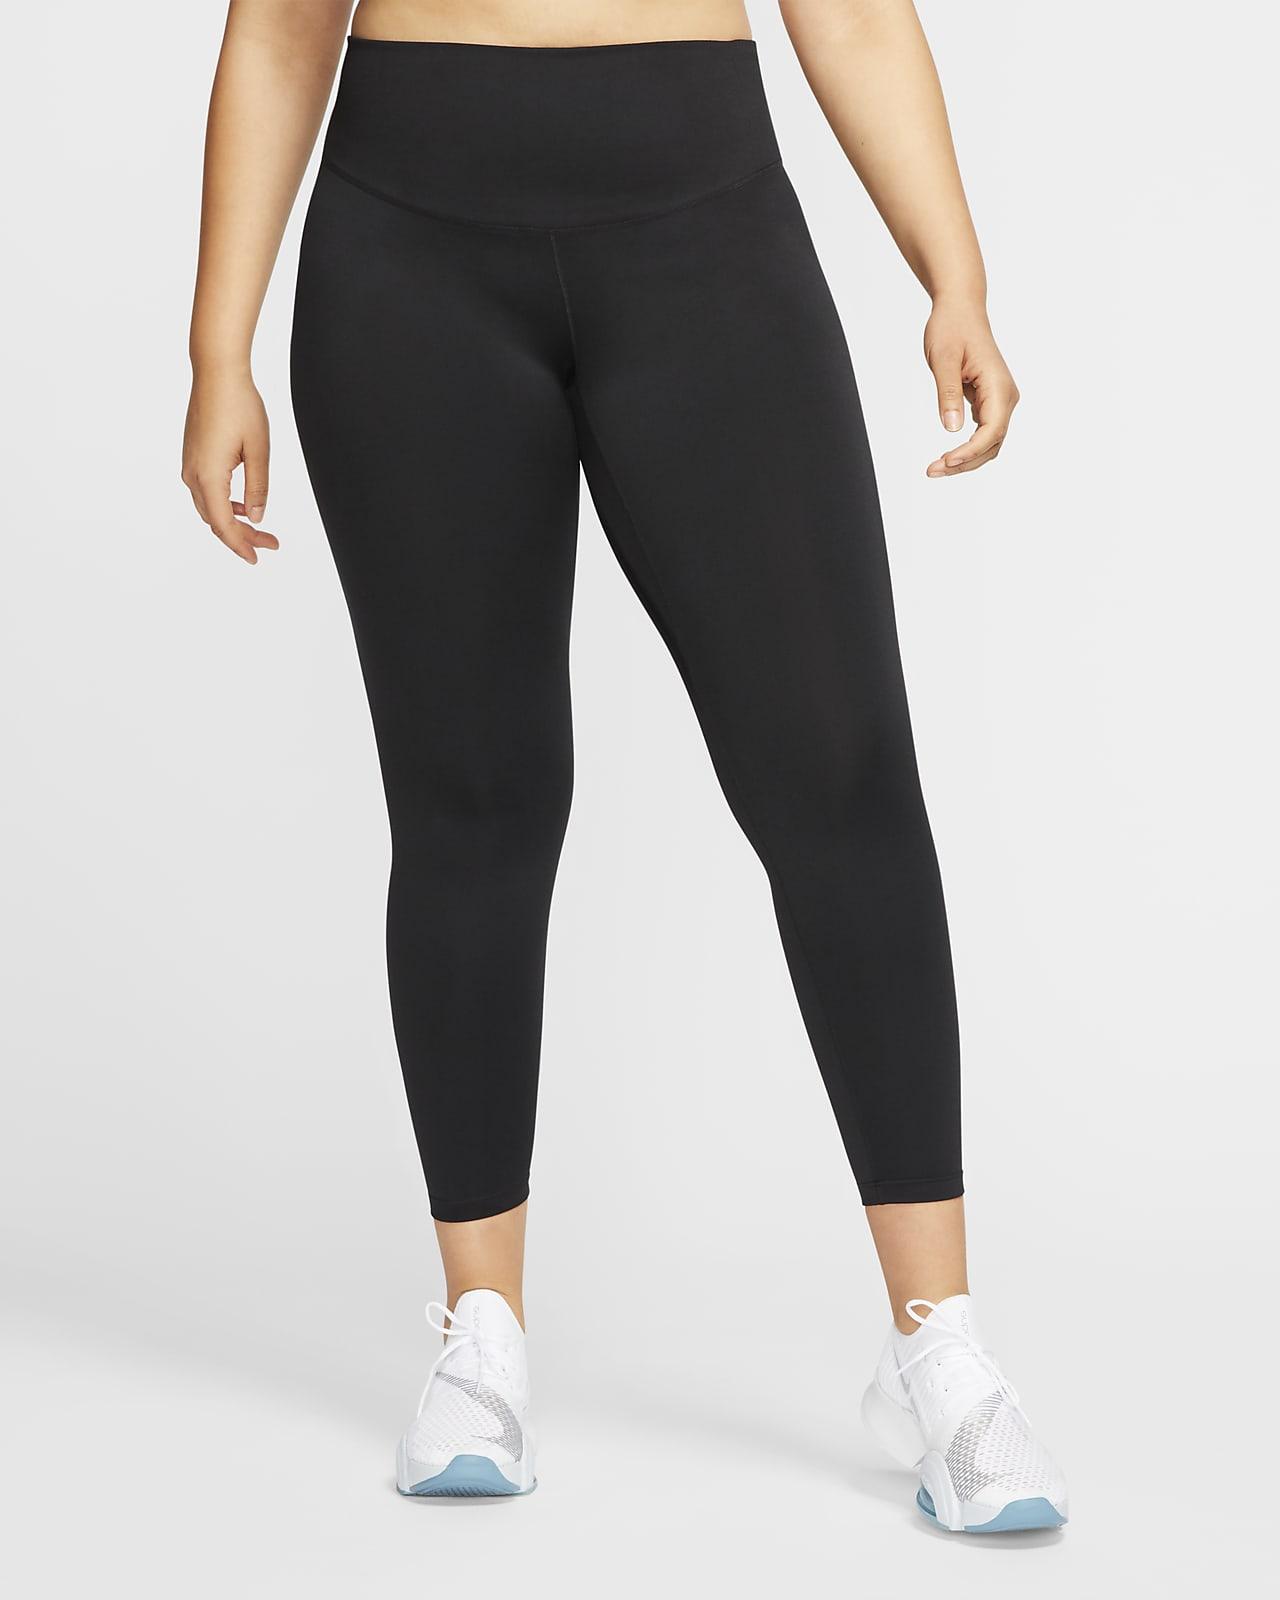 Leggings Nike One (Plus size) - Donna